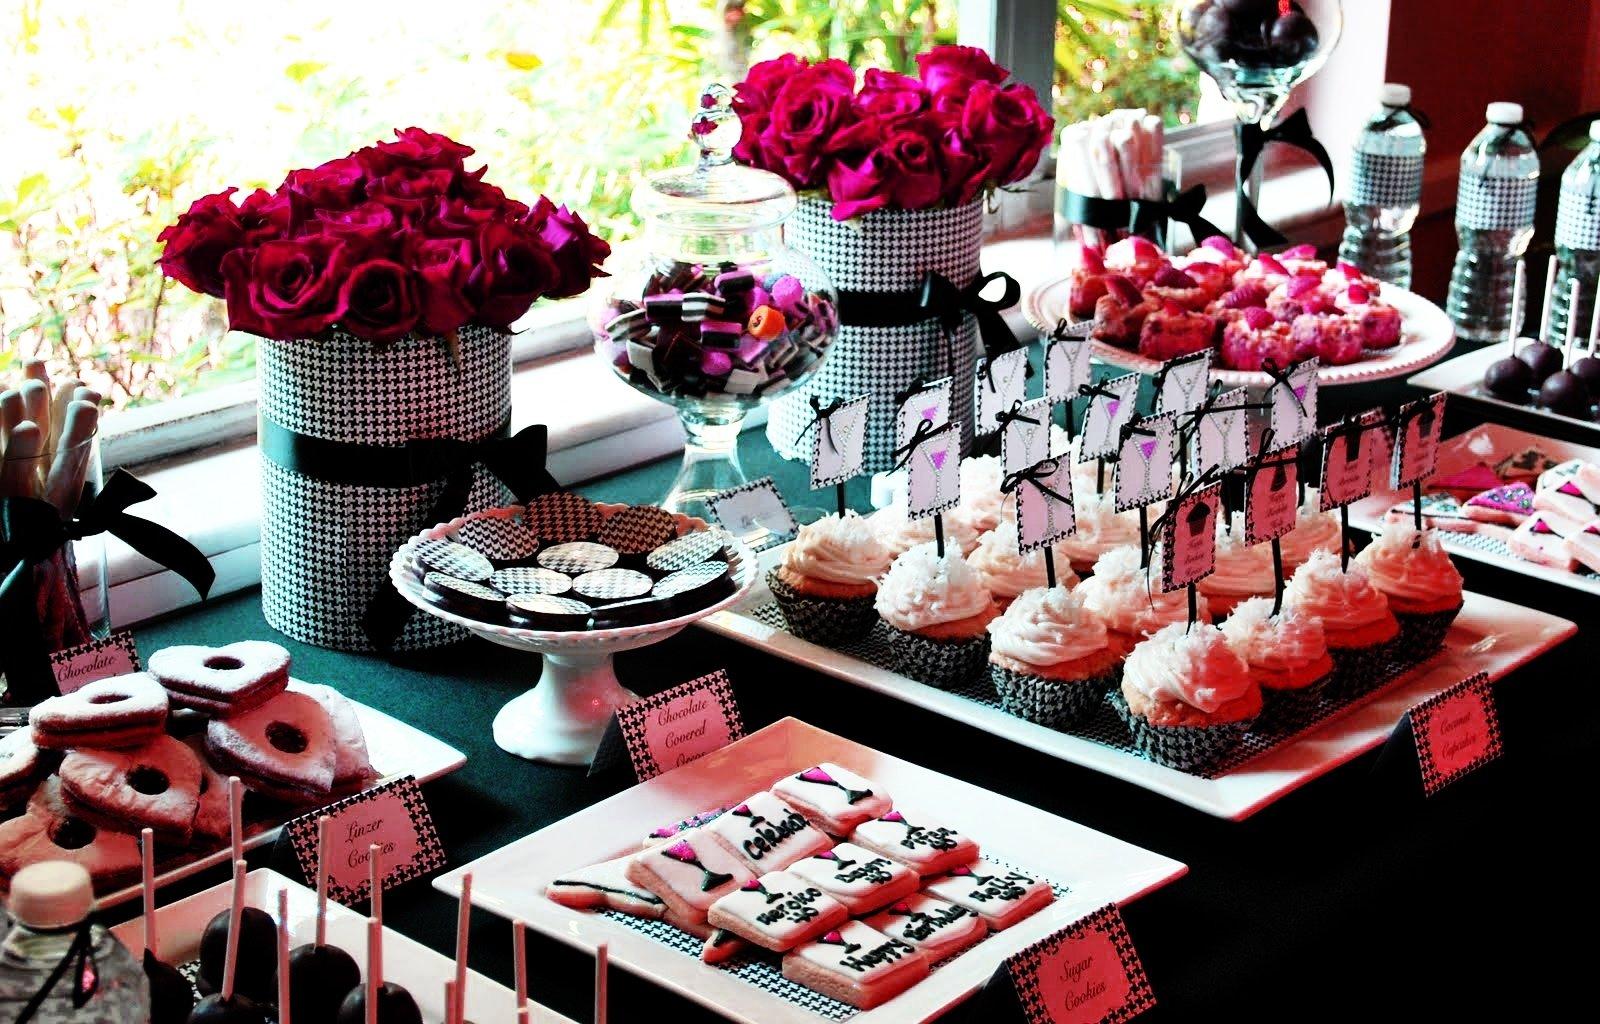 10 Unique Theme Party Ideas For Adults adult birthday party ideas adult birthday party ideas 2 3 2021